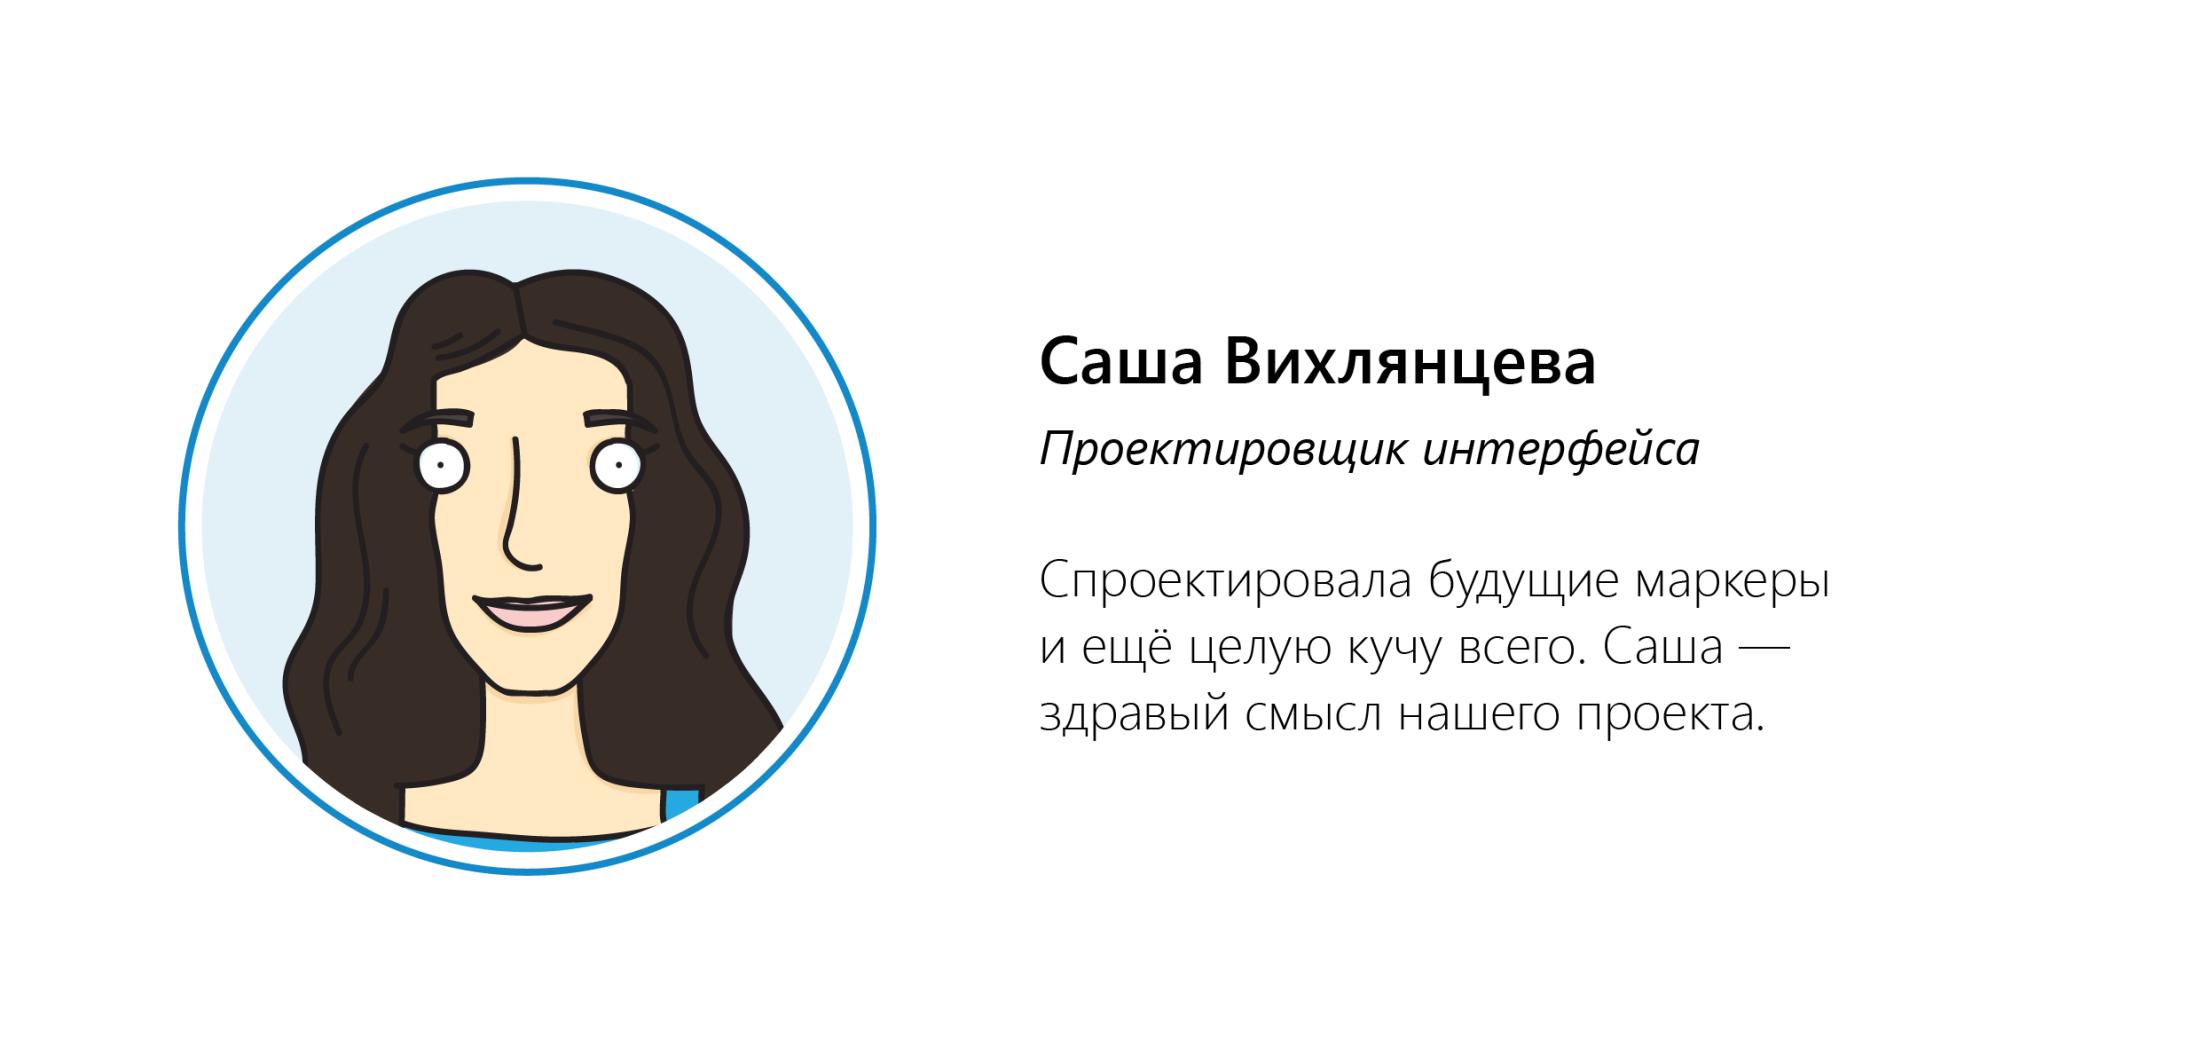 Саша Вихлянцева